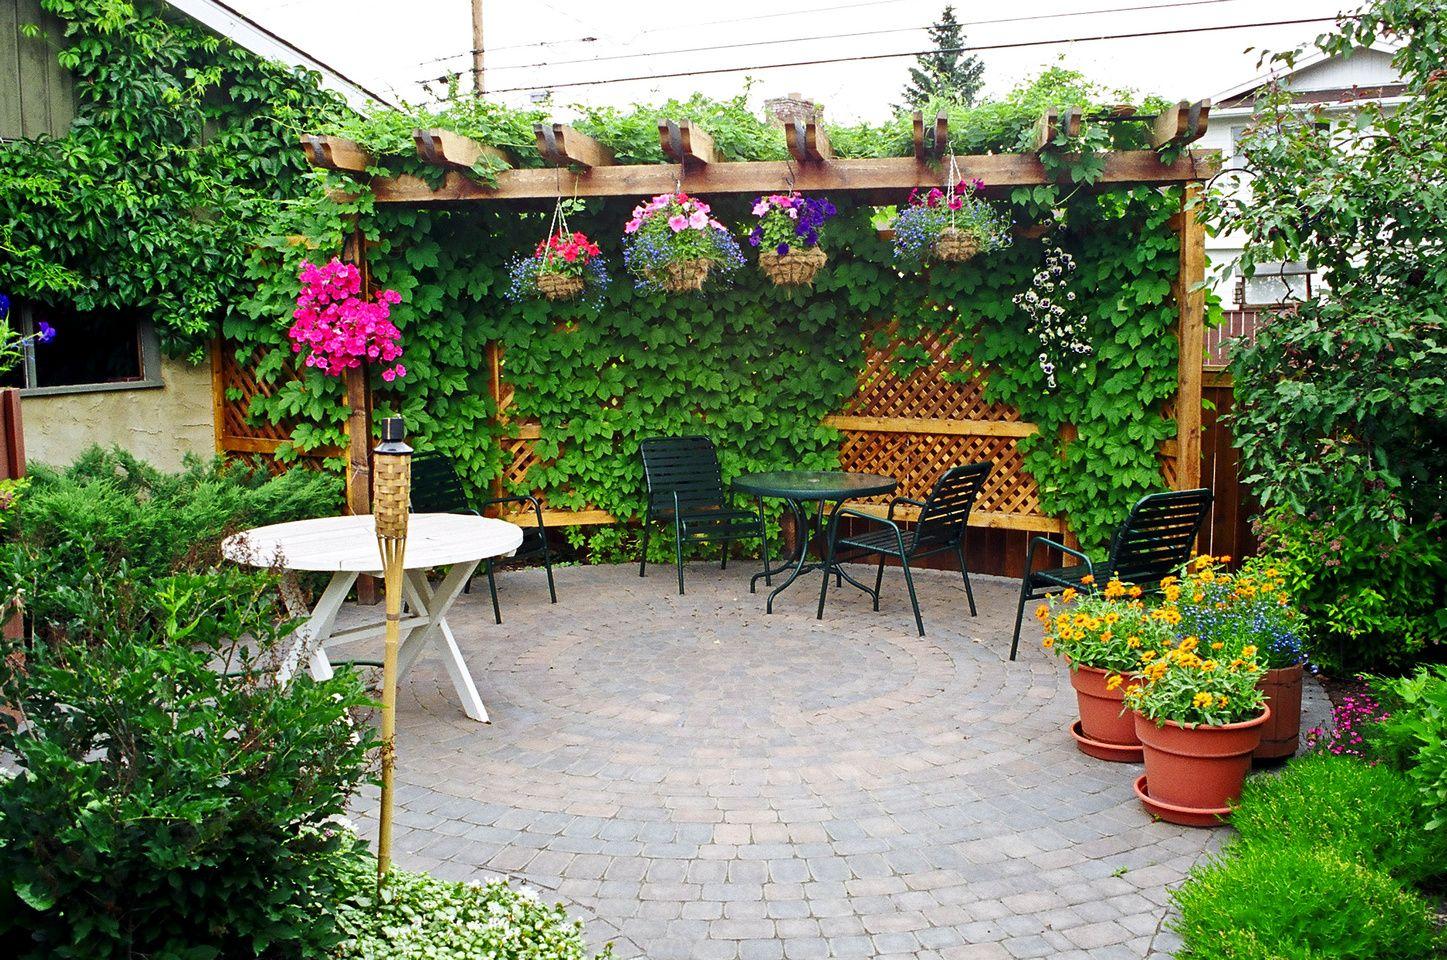 0d4cddfac14c6969224329591d5cf20c - Garden Designs For Small Gardens Picture